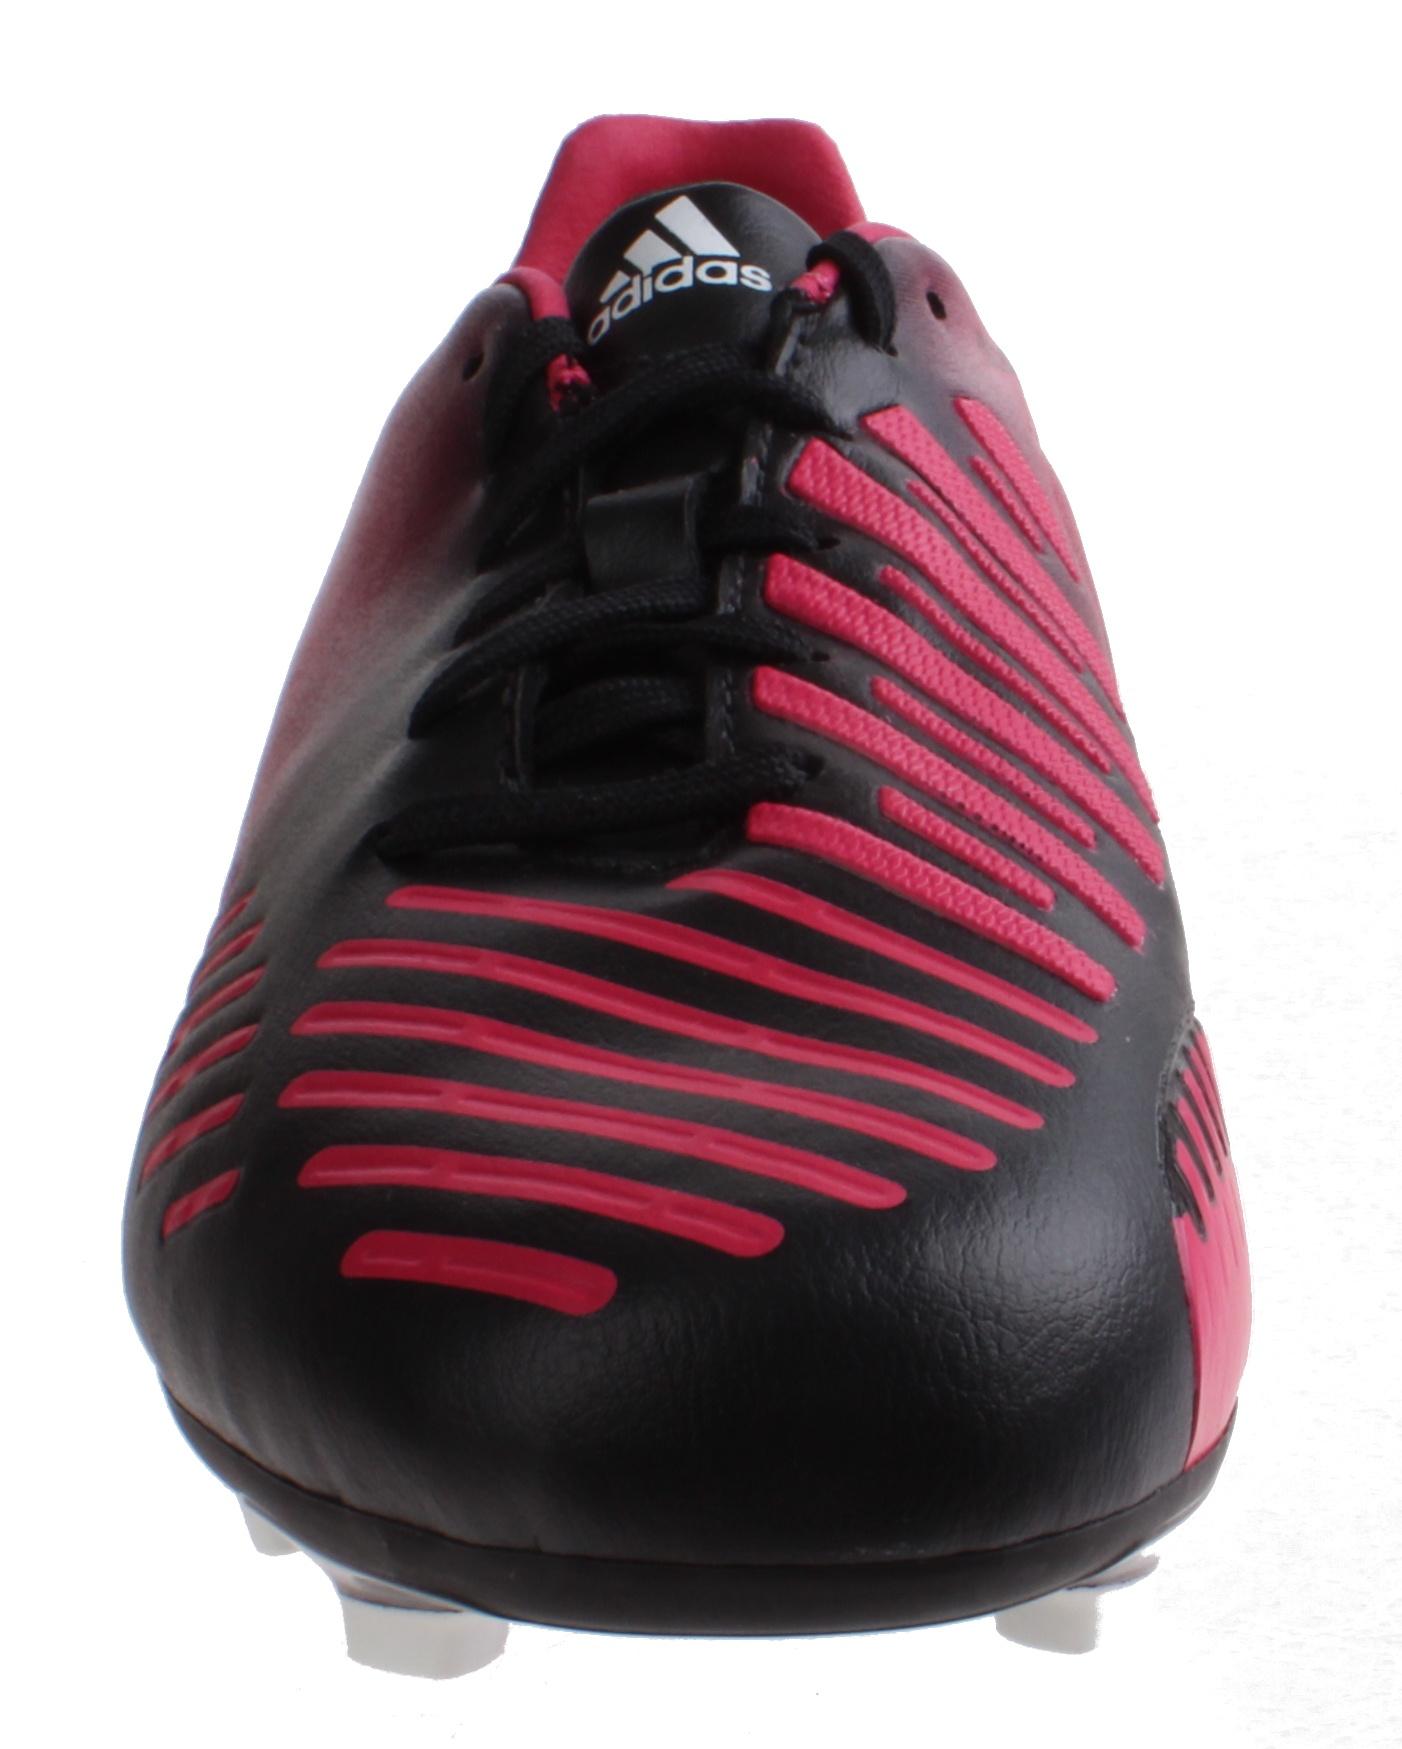 Dames Adidas Voetbalschoenen amp;casuals Roze Internet Sport R8qZ54